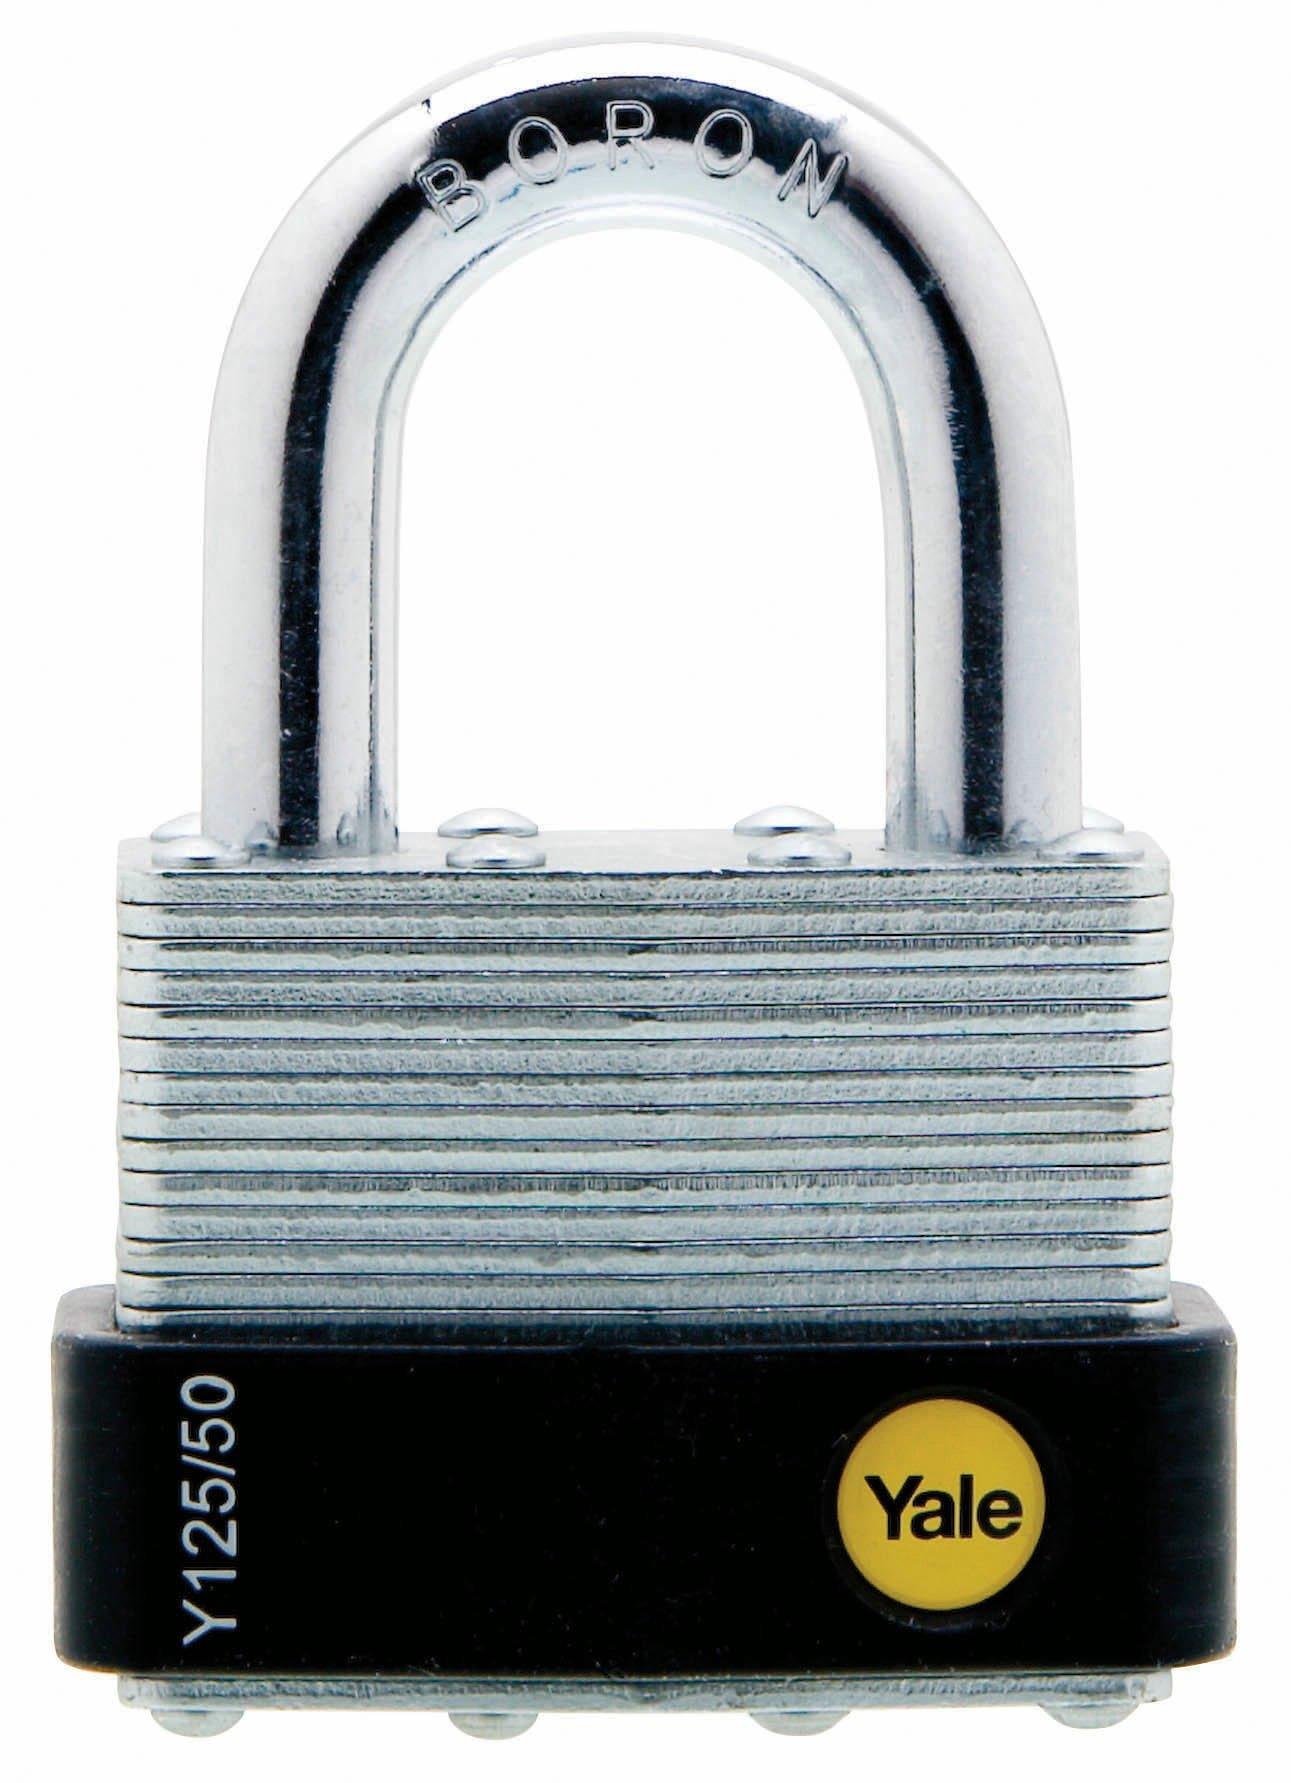 Y125 Laminated Steel Ball Locking Padlock